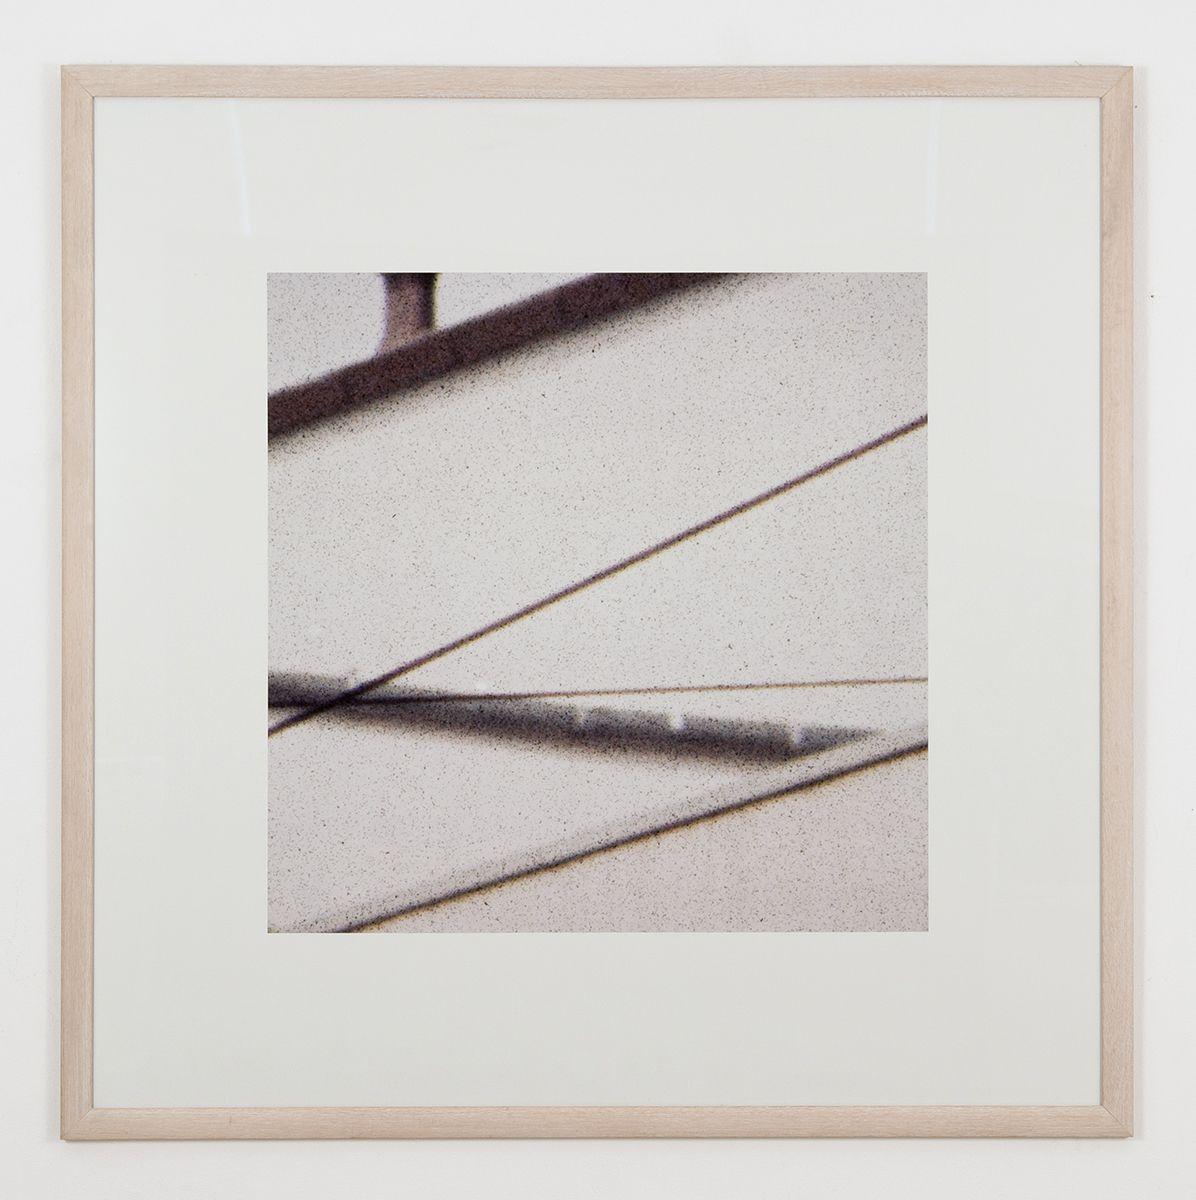 Eva Felten  untitled, 1992  Photograph  48 7/8 x 48 7/8 inches (124.1 x 124.1 cm)